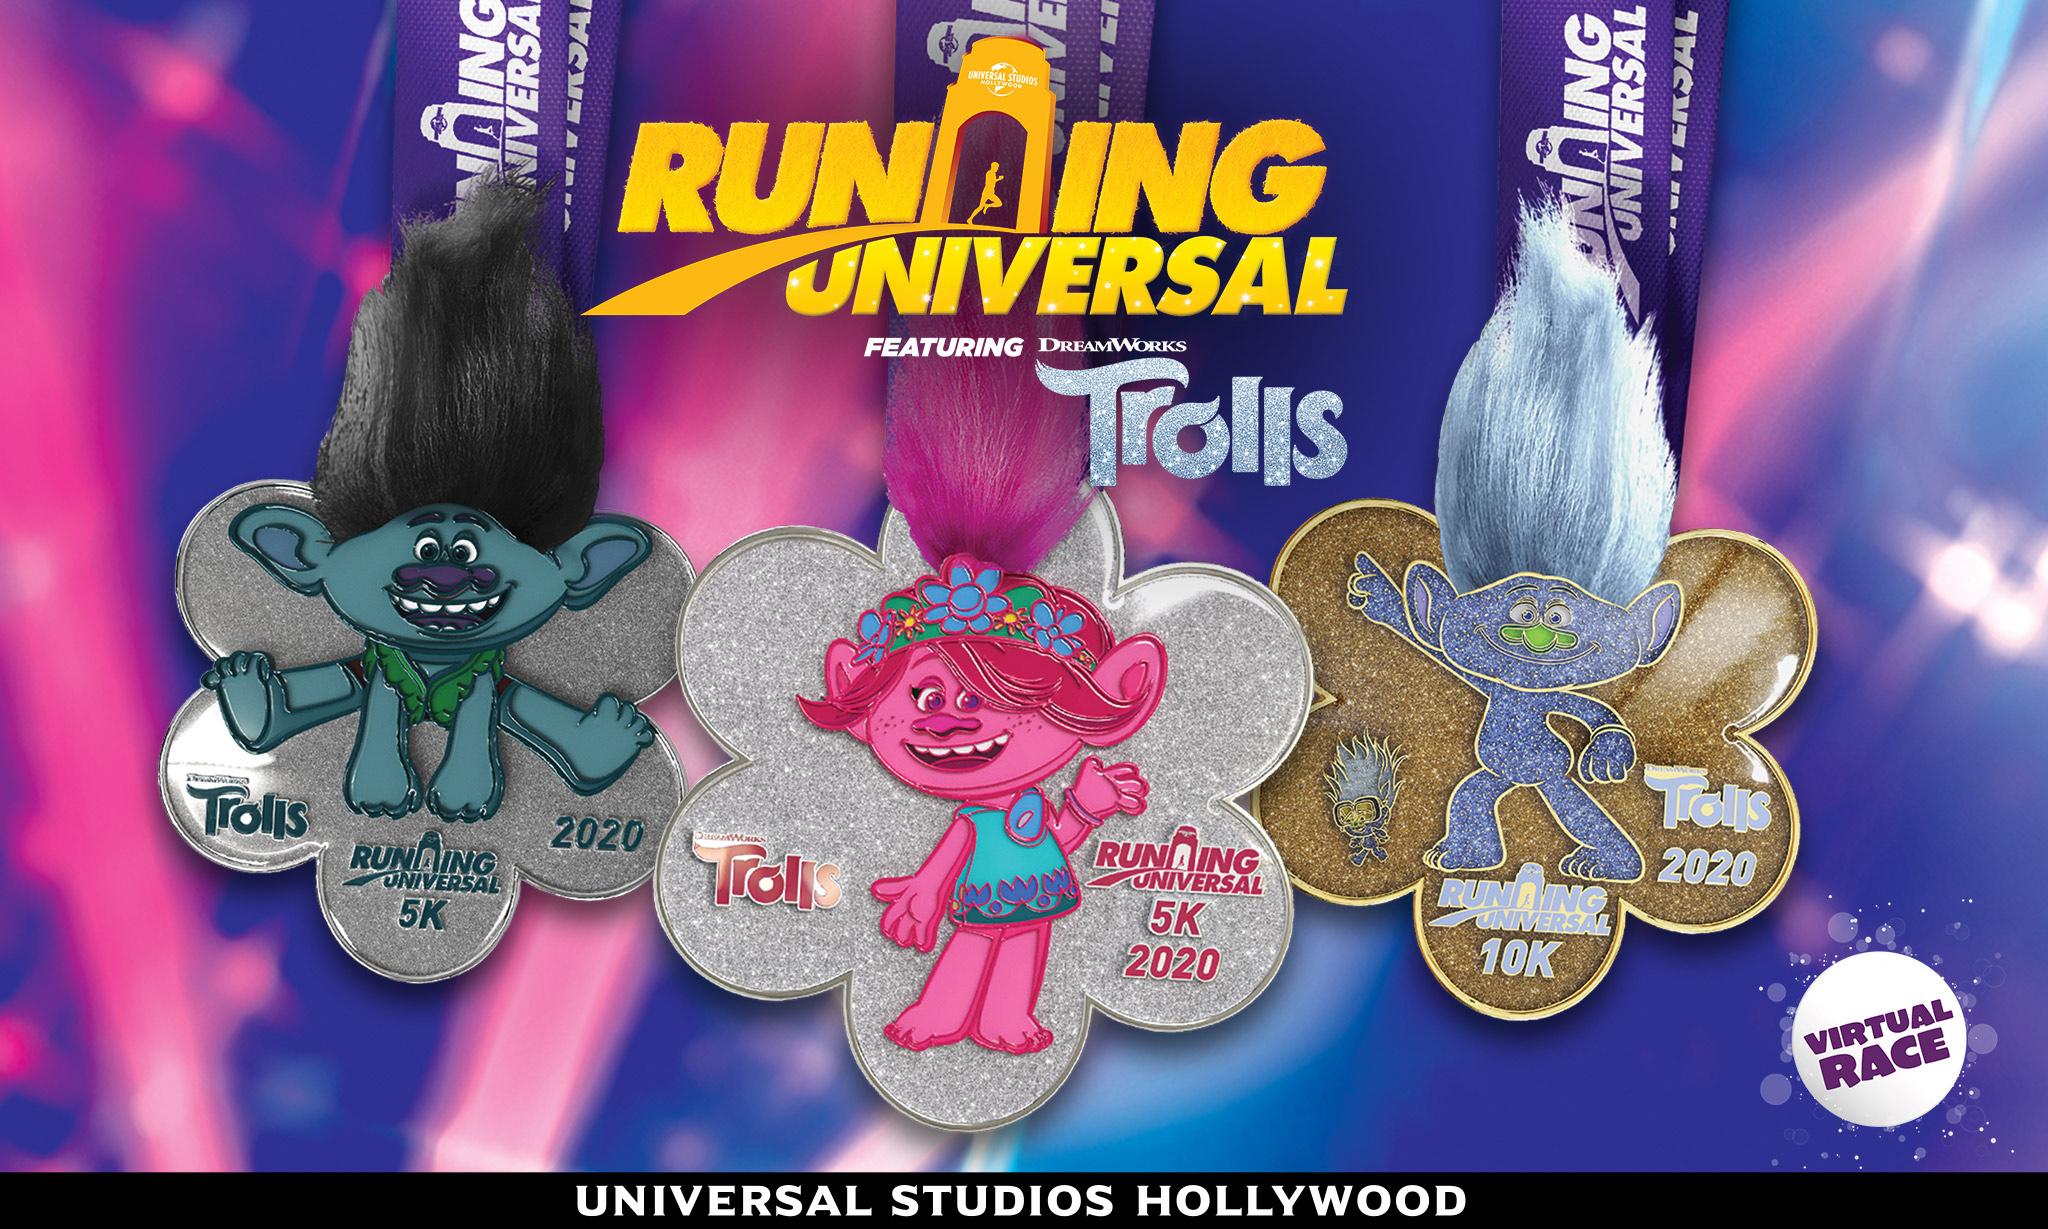 Running Universal - Trolls Virtual Race